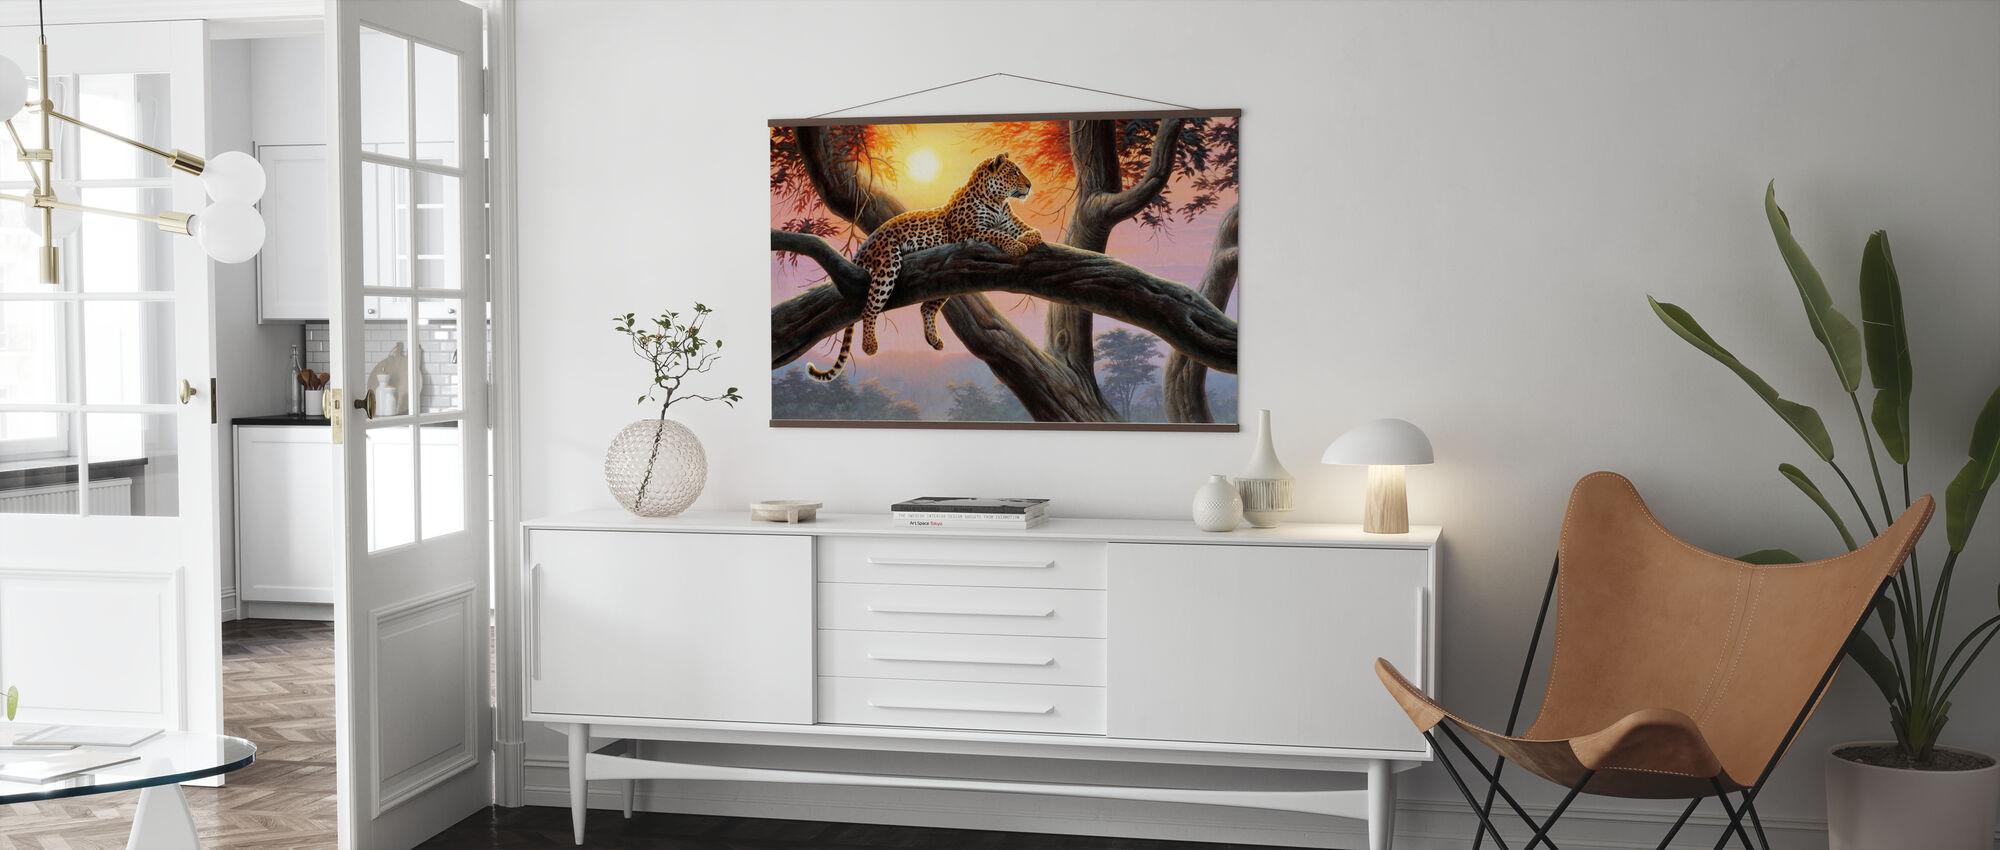 Evening Watch - Leopard - Poster - Living Room